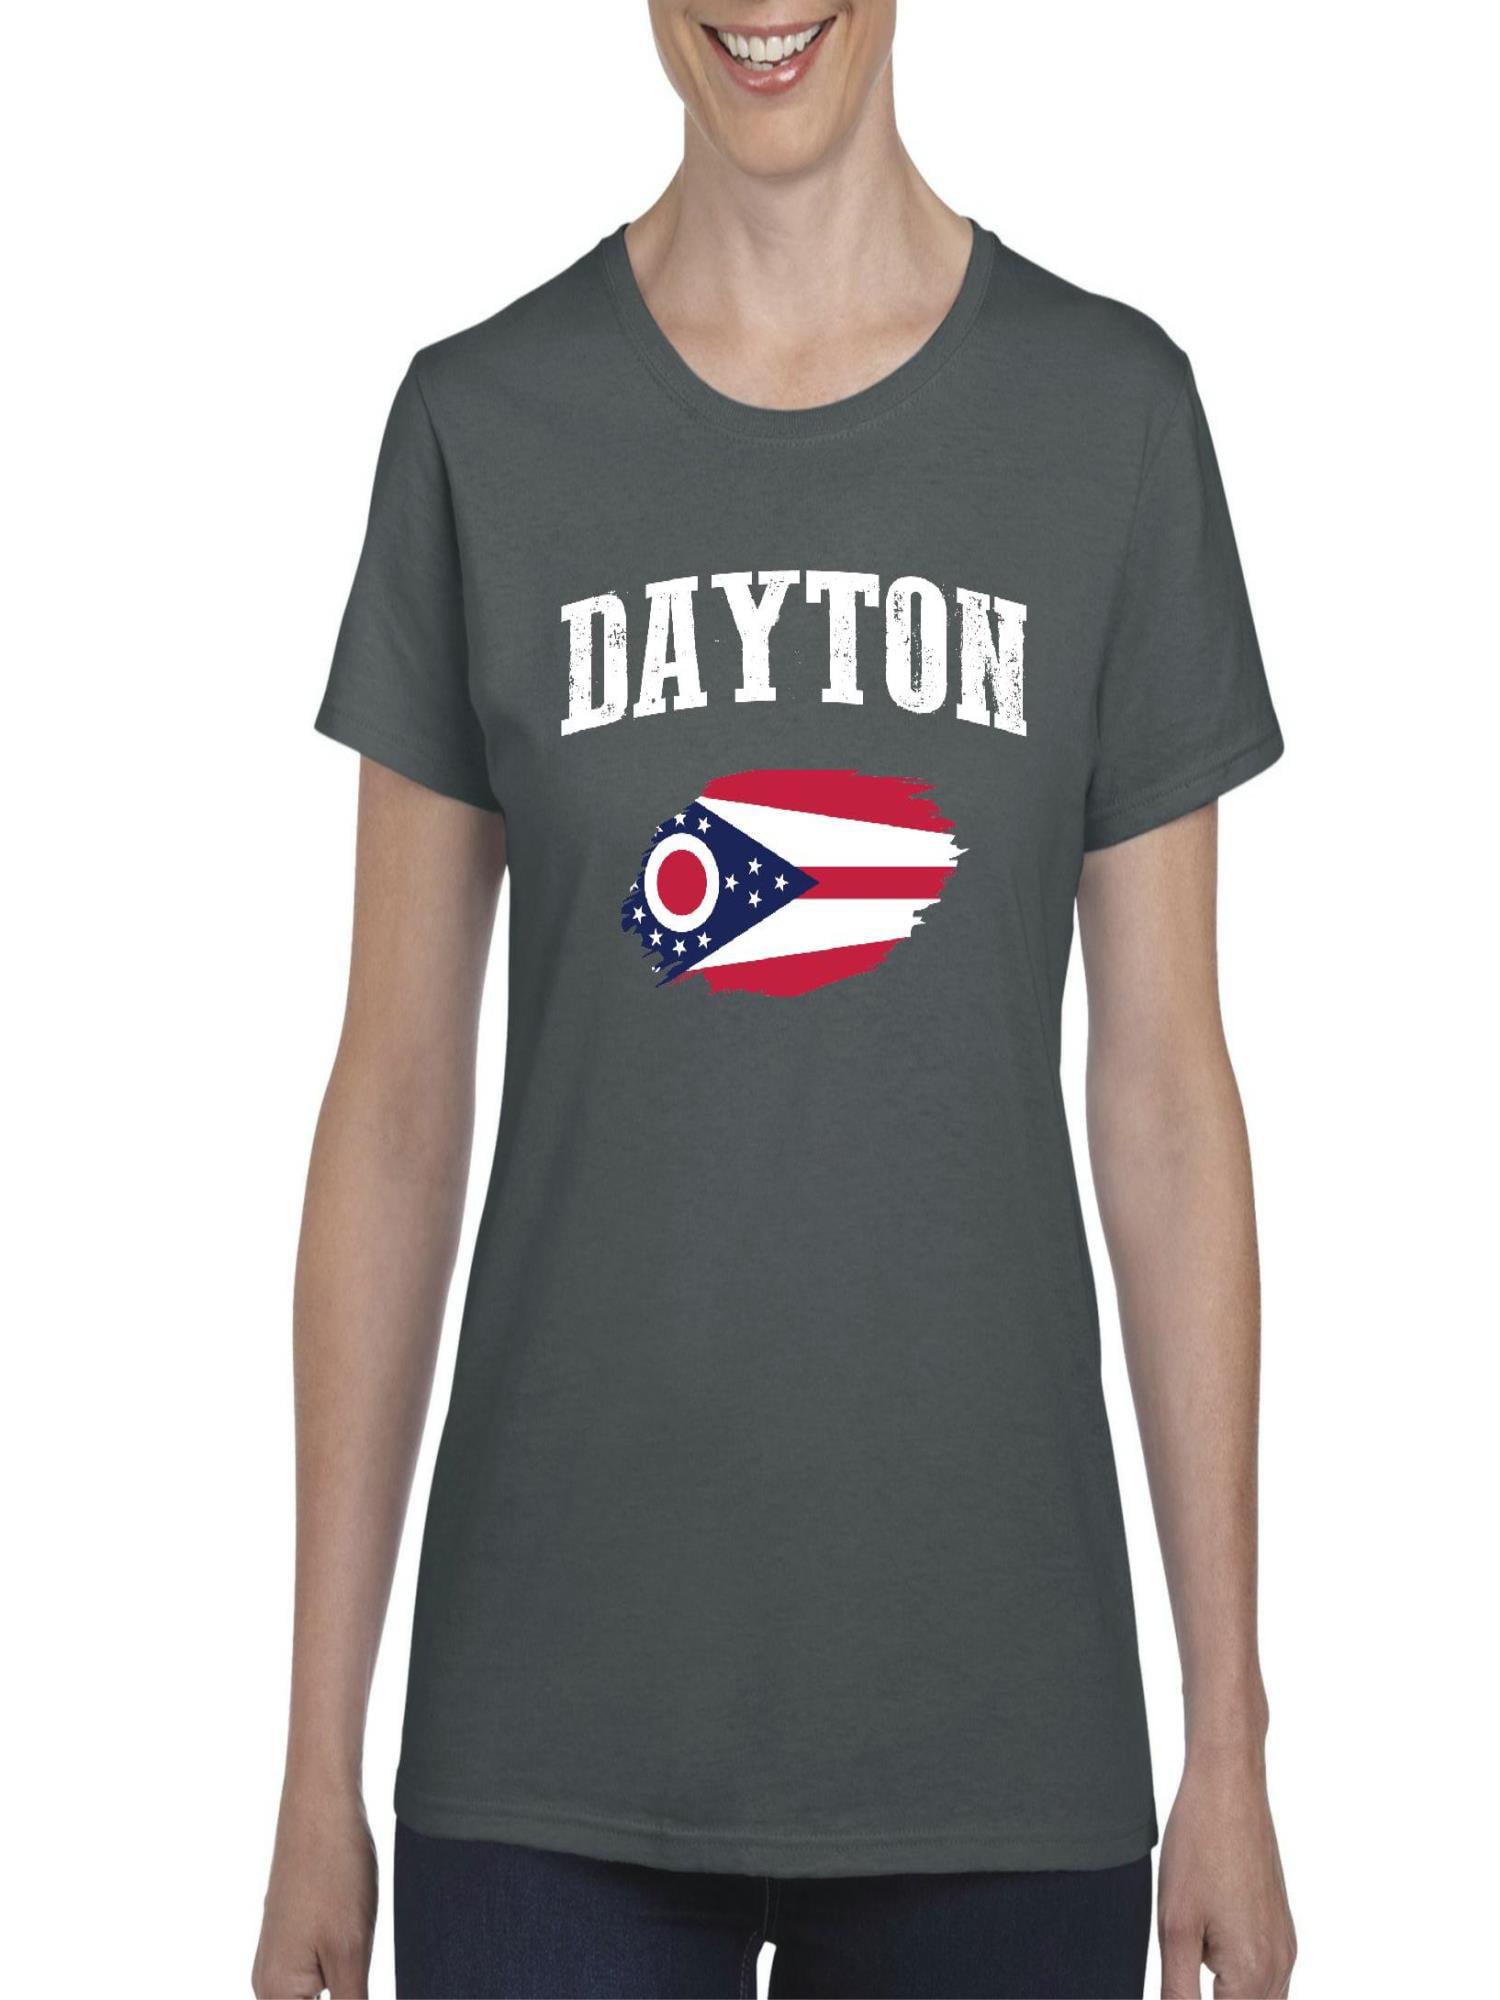 Normal Is Boring Dayton Ohio Women Shirts T Shirt Tee Walmart